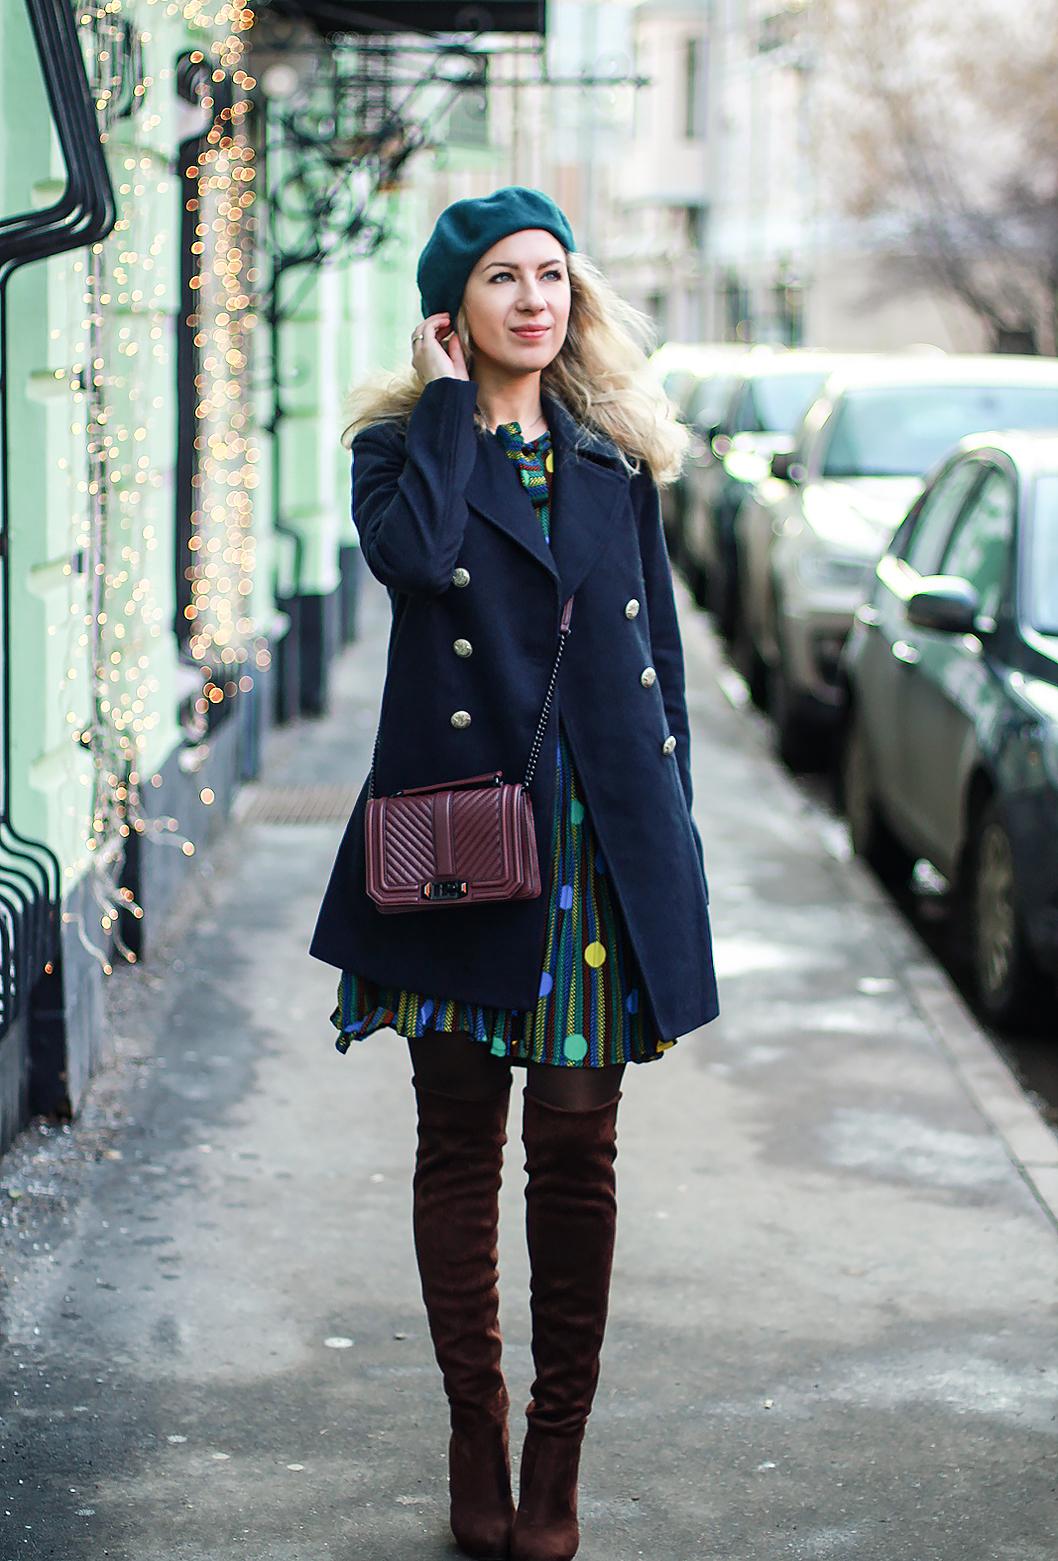 IMG_9672.JPG IMG_9691.JPG IMG_9707.JPG margarita_maslova_green_beret_print_dress_ PUSSY_BOW_BLOUSE_Rebecca_Minkoff_crossbody_bag_streetlook.psd margarita_maslova_green_beret_print_dress_ PUSSY_BOW_BLOUSE_Rebecca_Minkoff_crossbody_bag.jpg margarita_maslova_green_beret_print_dress_ PUSSY_BOW_BLOUSE_Rebecca_Minkoff_crossbody_bag1.jpg margarita_maslova_green_beret_print_dress_ PUSSY_BOW_BLOUSE_Rebecca_Minkoff_crossbody_bag2.jpg margarita_maslova_green_beret_print_dress_ PUSSY_BOW_BLOUSE_Rebecca_Minkoff_crossbody_bag3.jpg margarita_maslova_green_beret_print_dress_ PUSSY_BOW_BLOUSE_Rebecca_Minkoff_crossbody_bag4.jpg margarita_maslova_green_beret_print_dress_ PUSSY_BOW_BLOUSE_Rebecca_Minkoff_crossbody_bag5.jpg margarita_maslova_green_beret_print_dress_ PUSSY_BOW_BLOUSE_Rebecca_Minkoff_crossbody_bag6.jpg margarita_maslova_green_beret_print_dress_ PUSSY_BOW_BLOUSE_Rebecca_Minkoff_crossbody_bag7.jpg margarita_maslova_green_beret_print_dress_ PUSSY_BOW_BLOUSE_Rebecca_Minkoff_crossbody_bag9.jpg